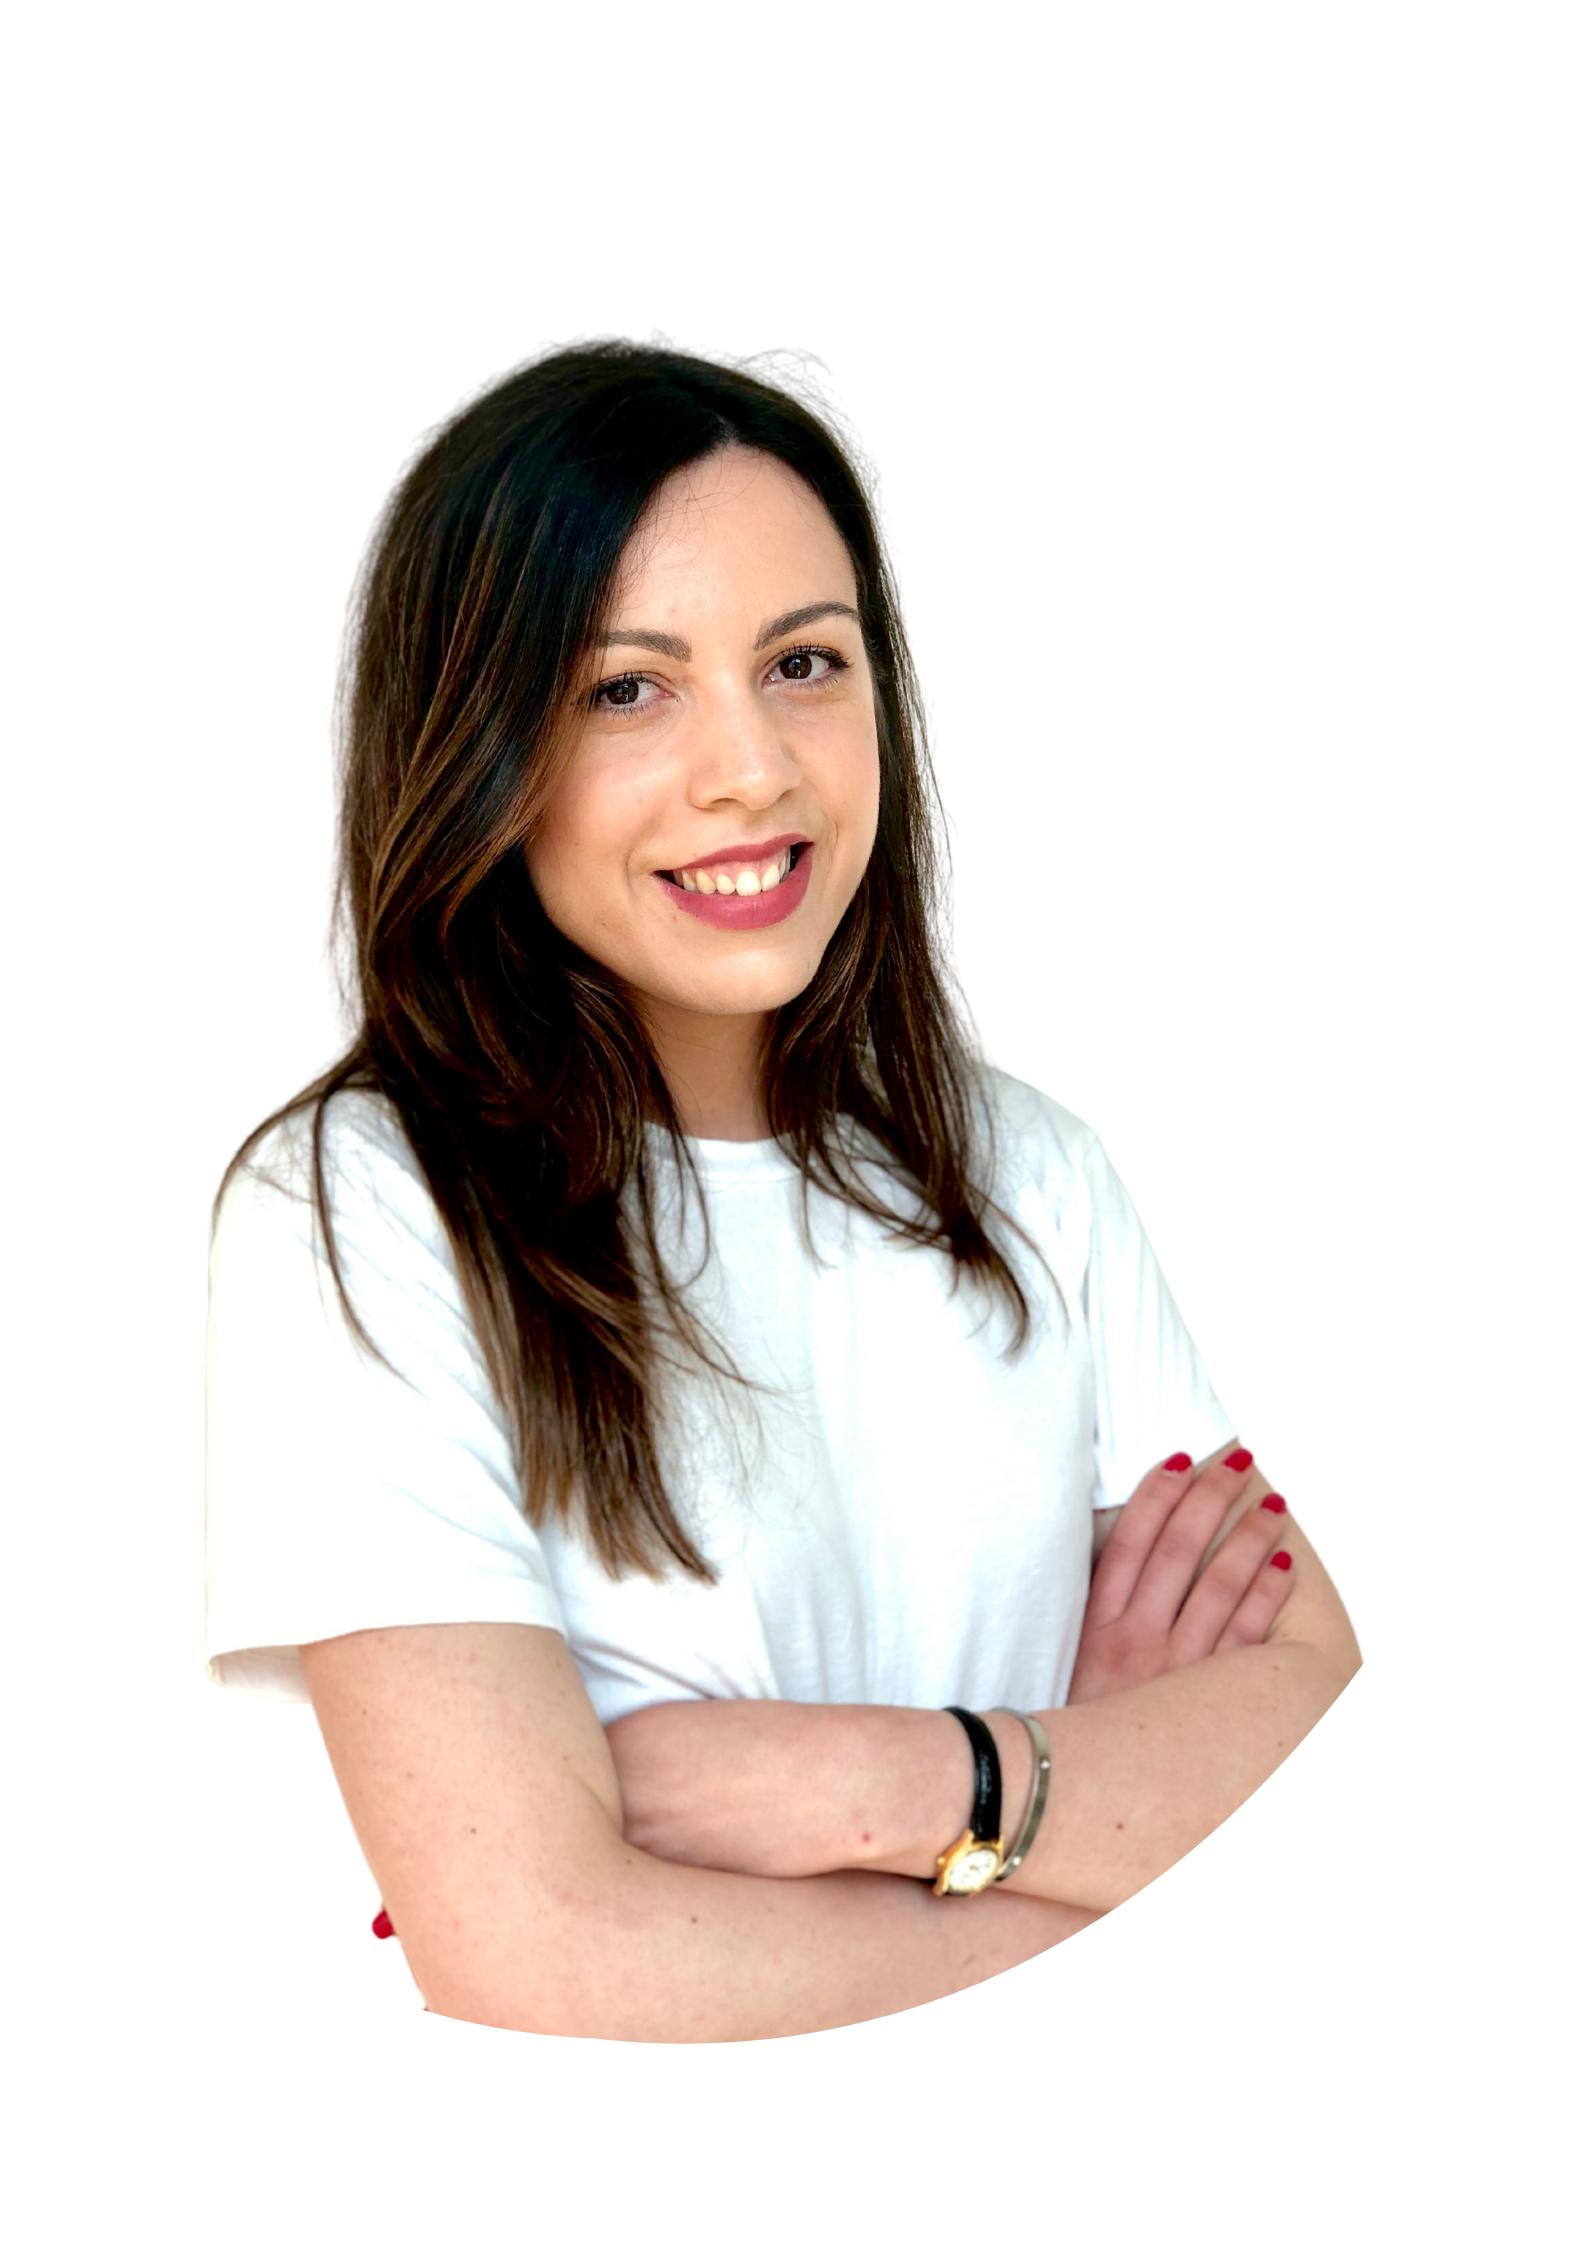 Maria Padovano